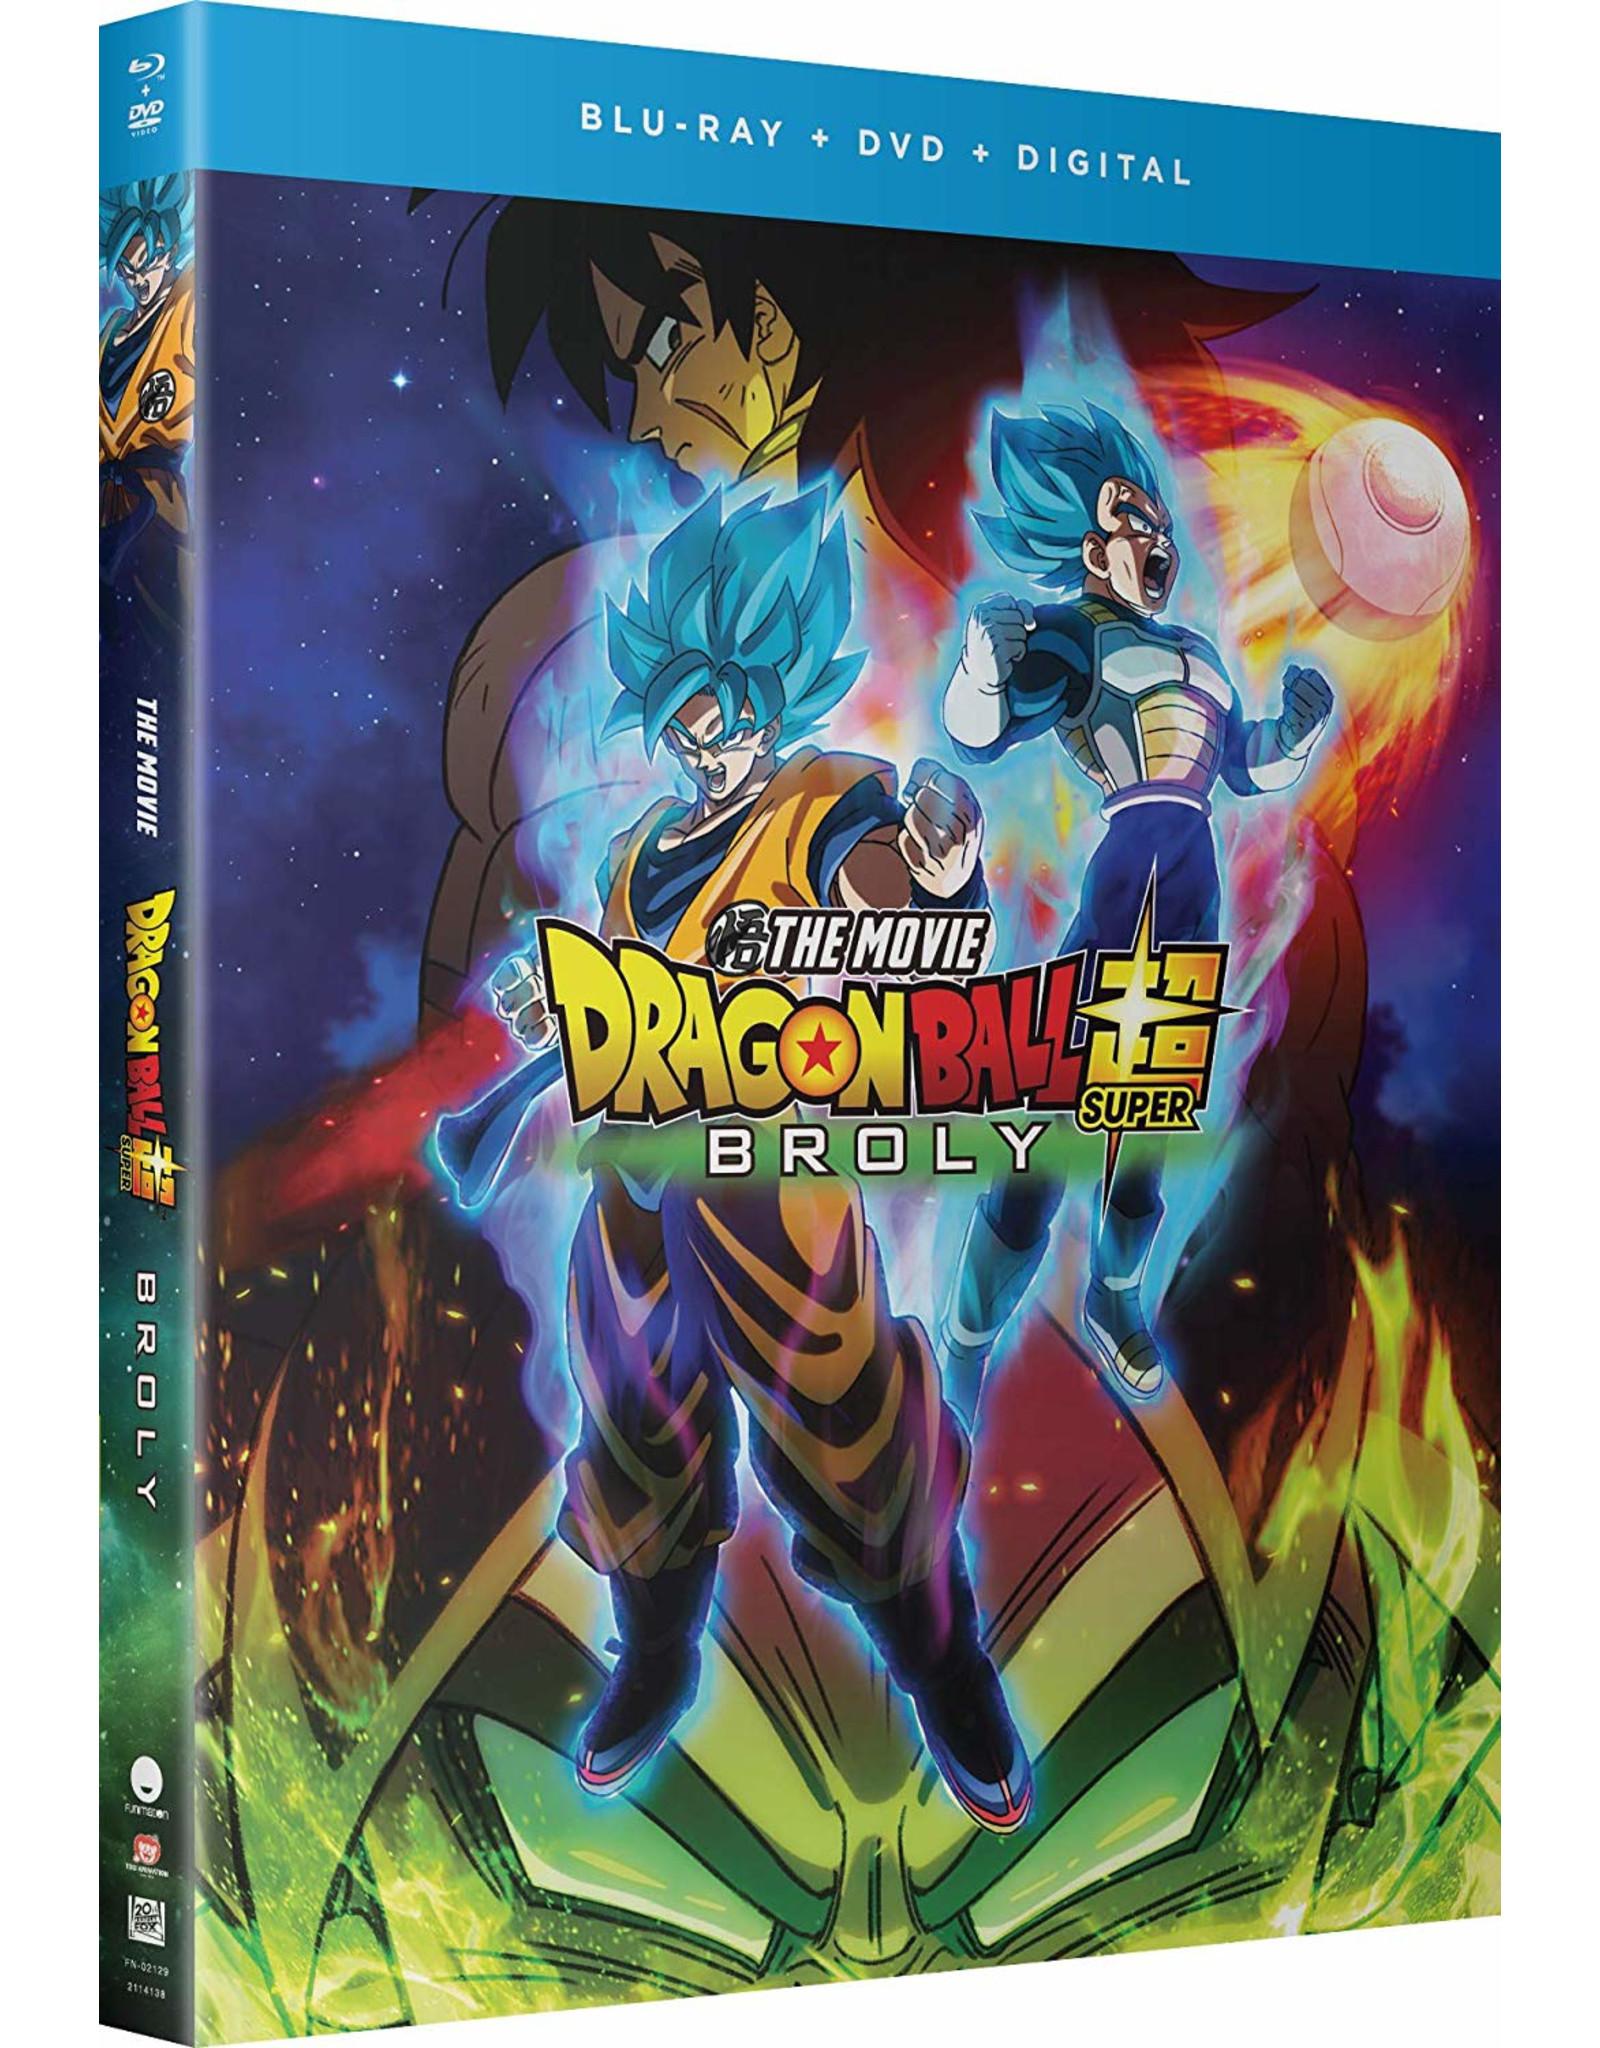 Dragon Ball Super:  Broly (Blu-ray) - (Original version, English subtitles)